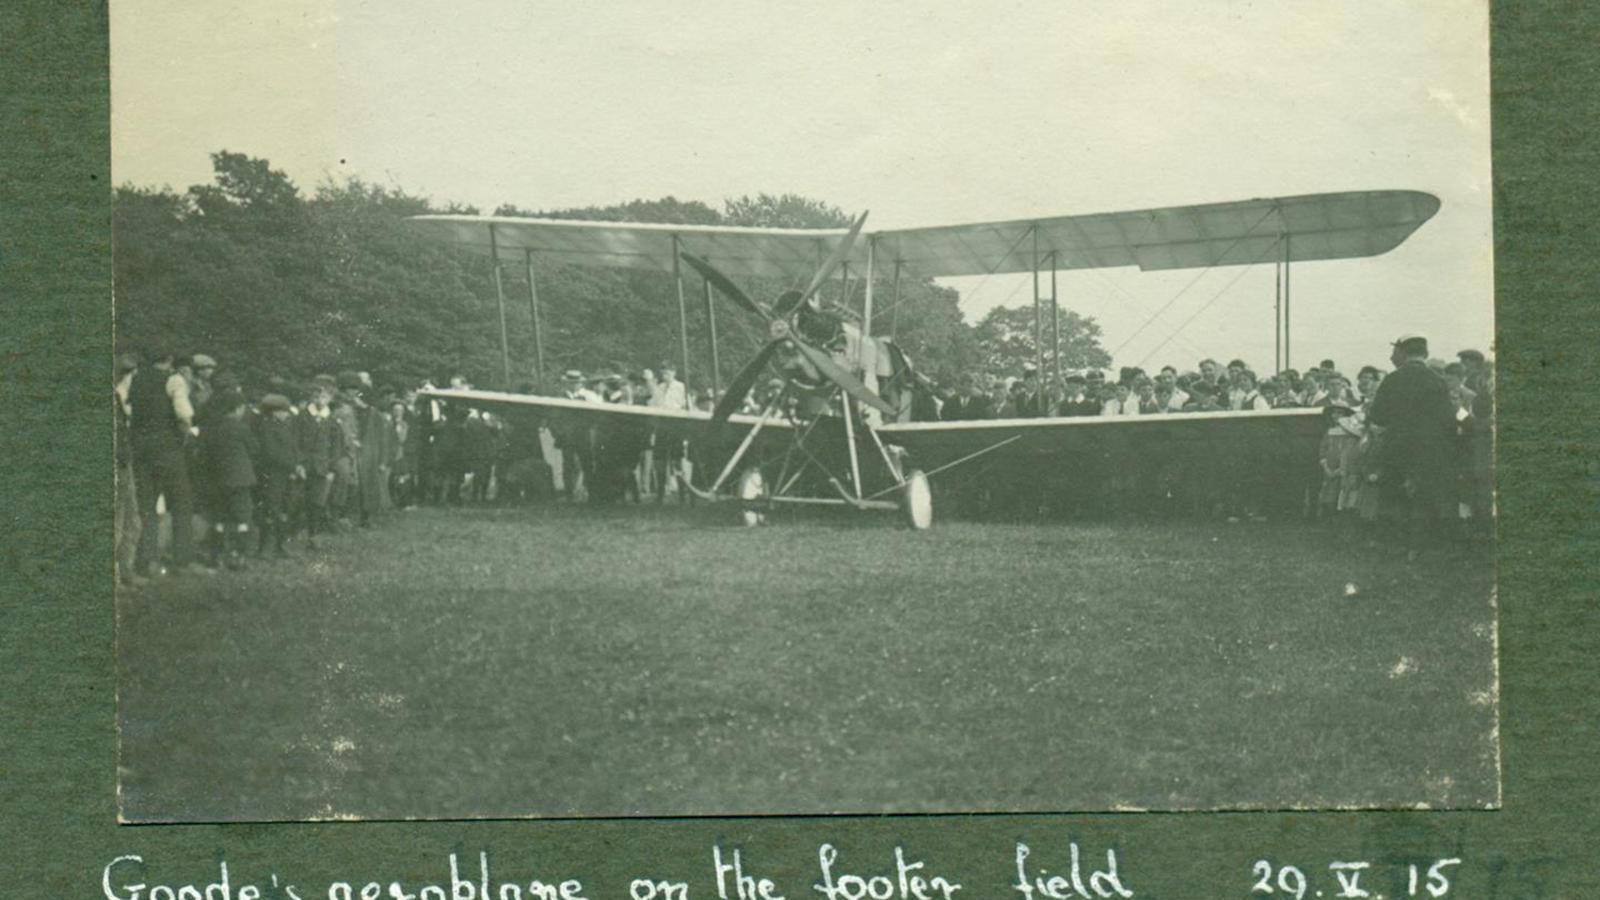 Goode Plane, 1915